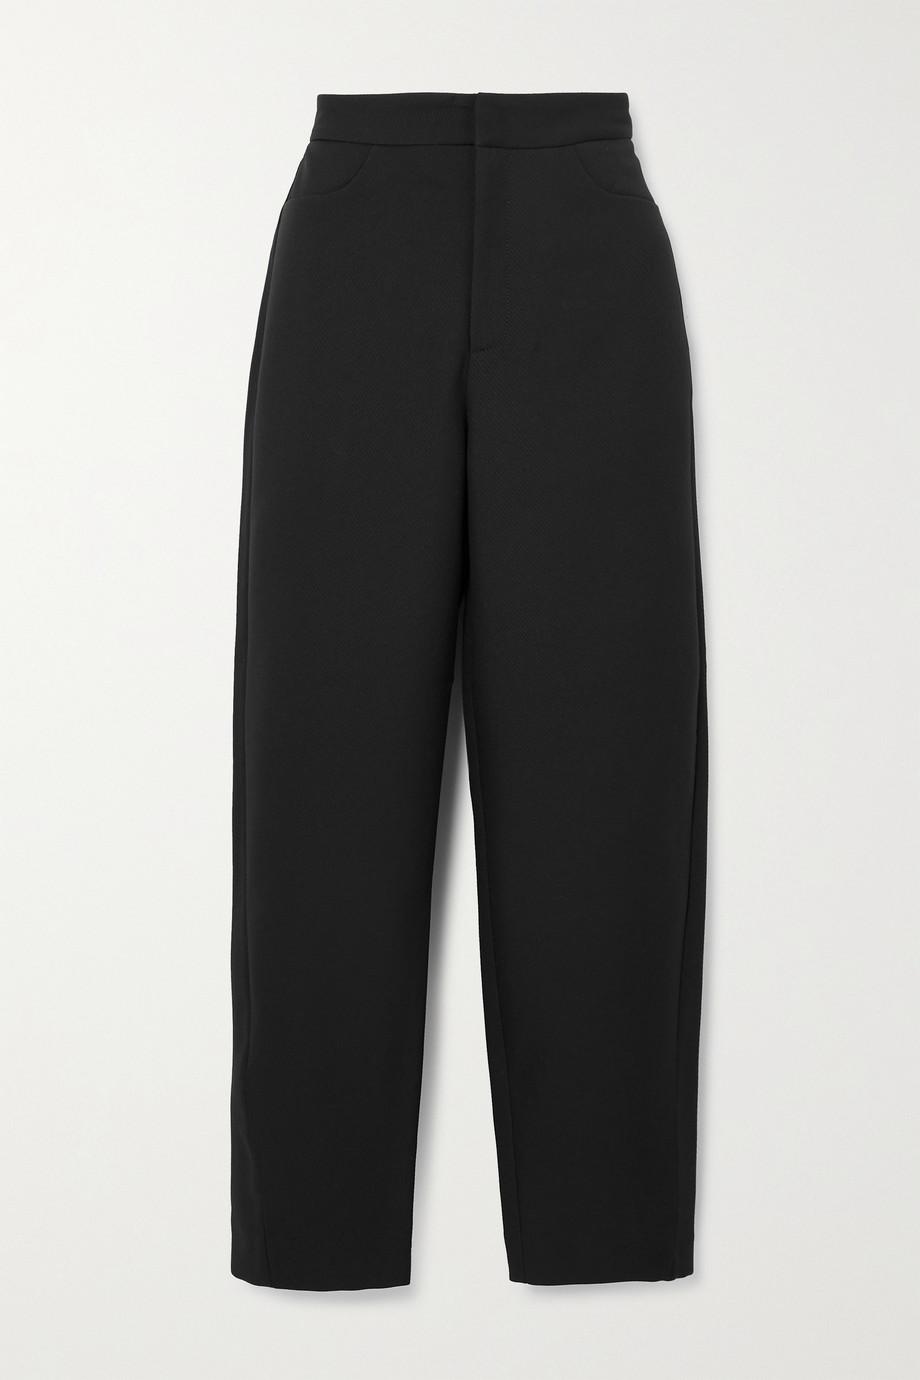 Totême Cropped twill straight-leg pants